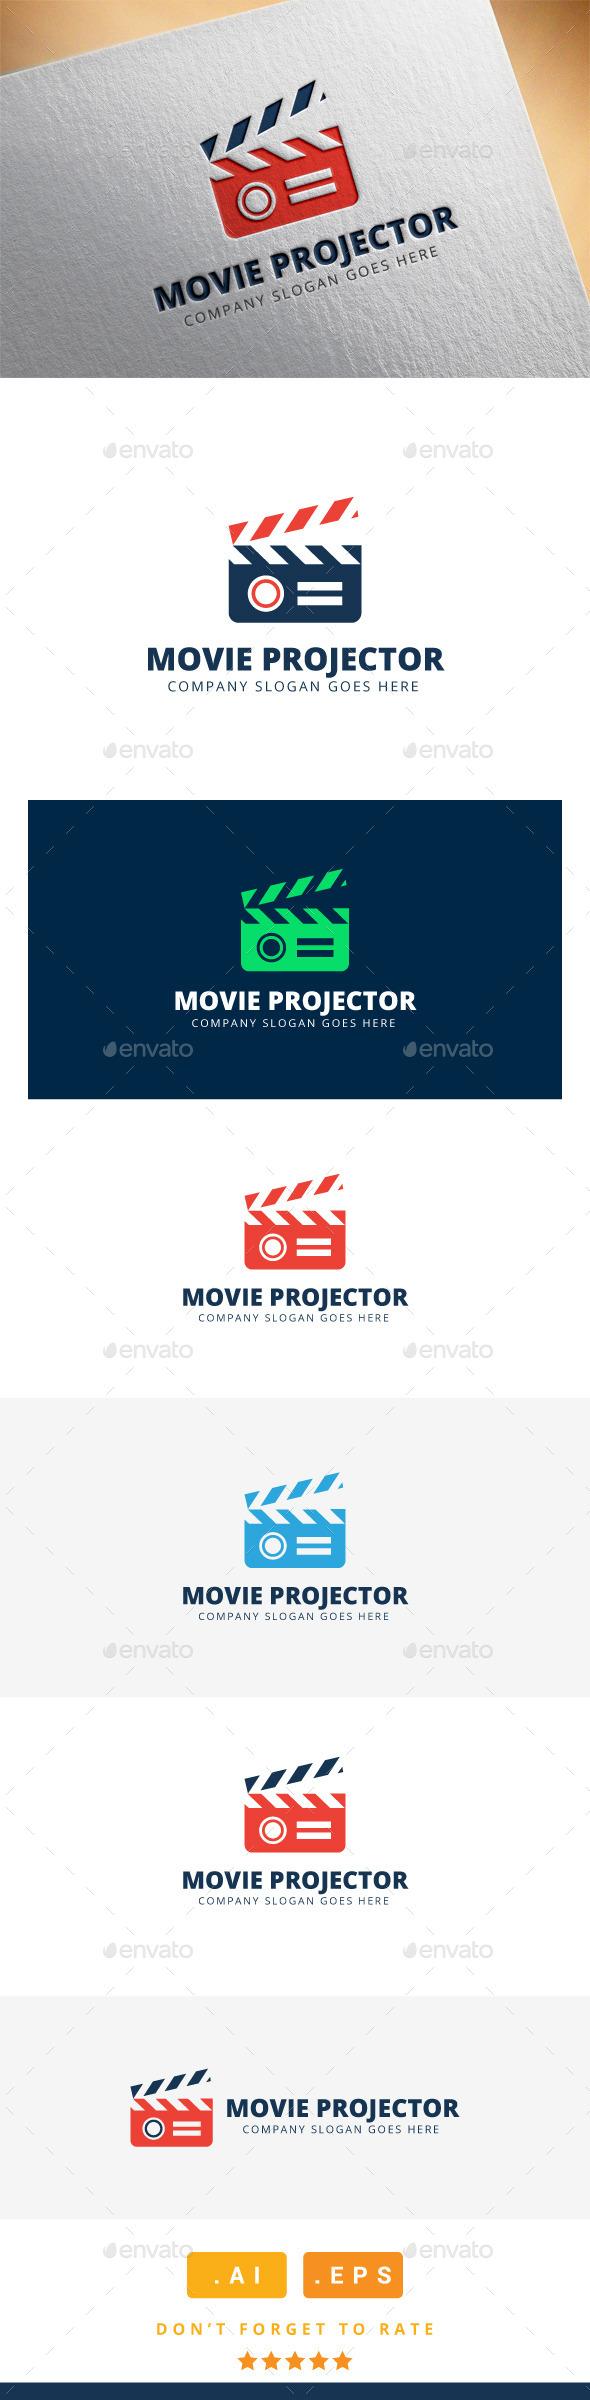 GraphicRiver Movie Projector Logo 11508421